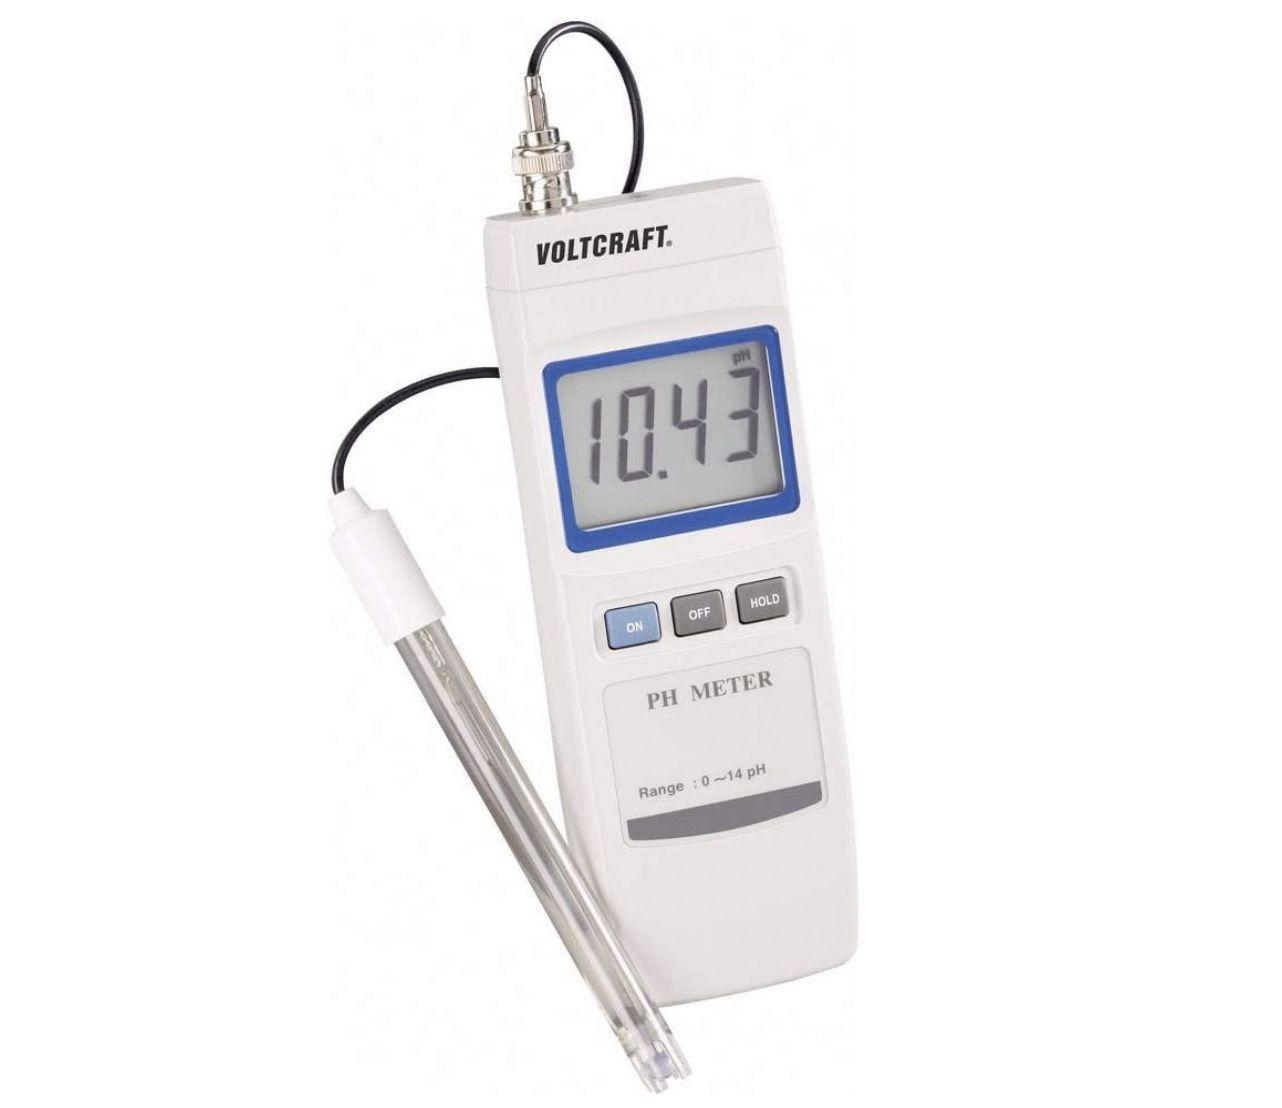 Voltcraft PH 100 ATC pH Messgerät für 33€ (statt 89€)   Tiefstpreis